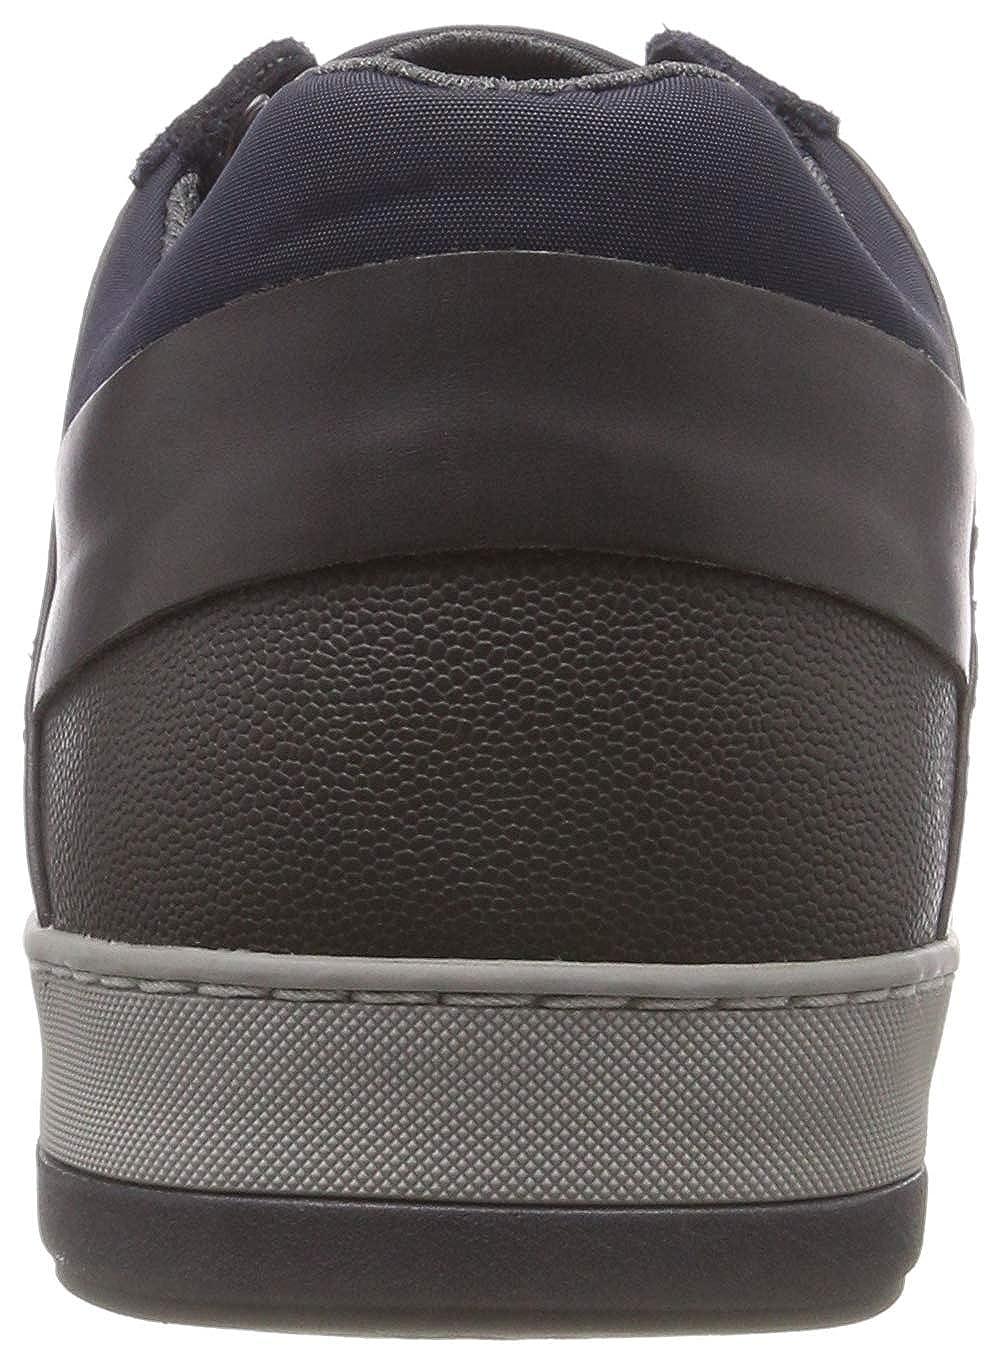 Geox U Handtaschen Ariam D Herren SneakerSchuheamp; fY76gyb